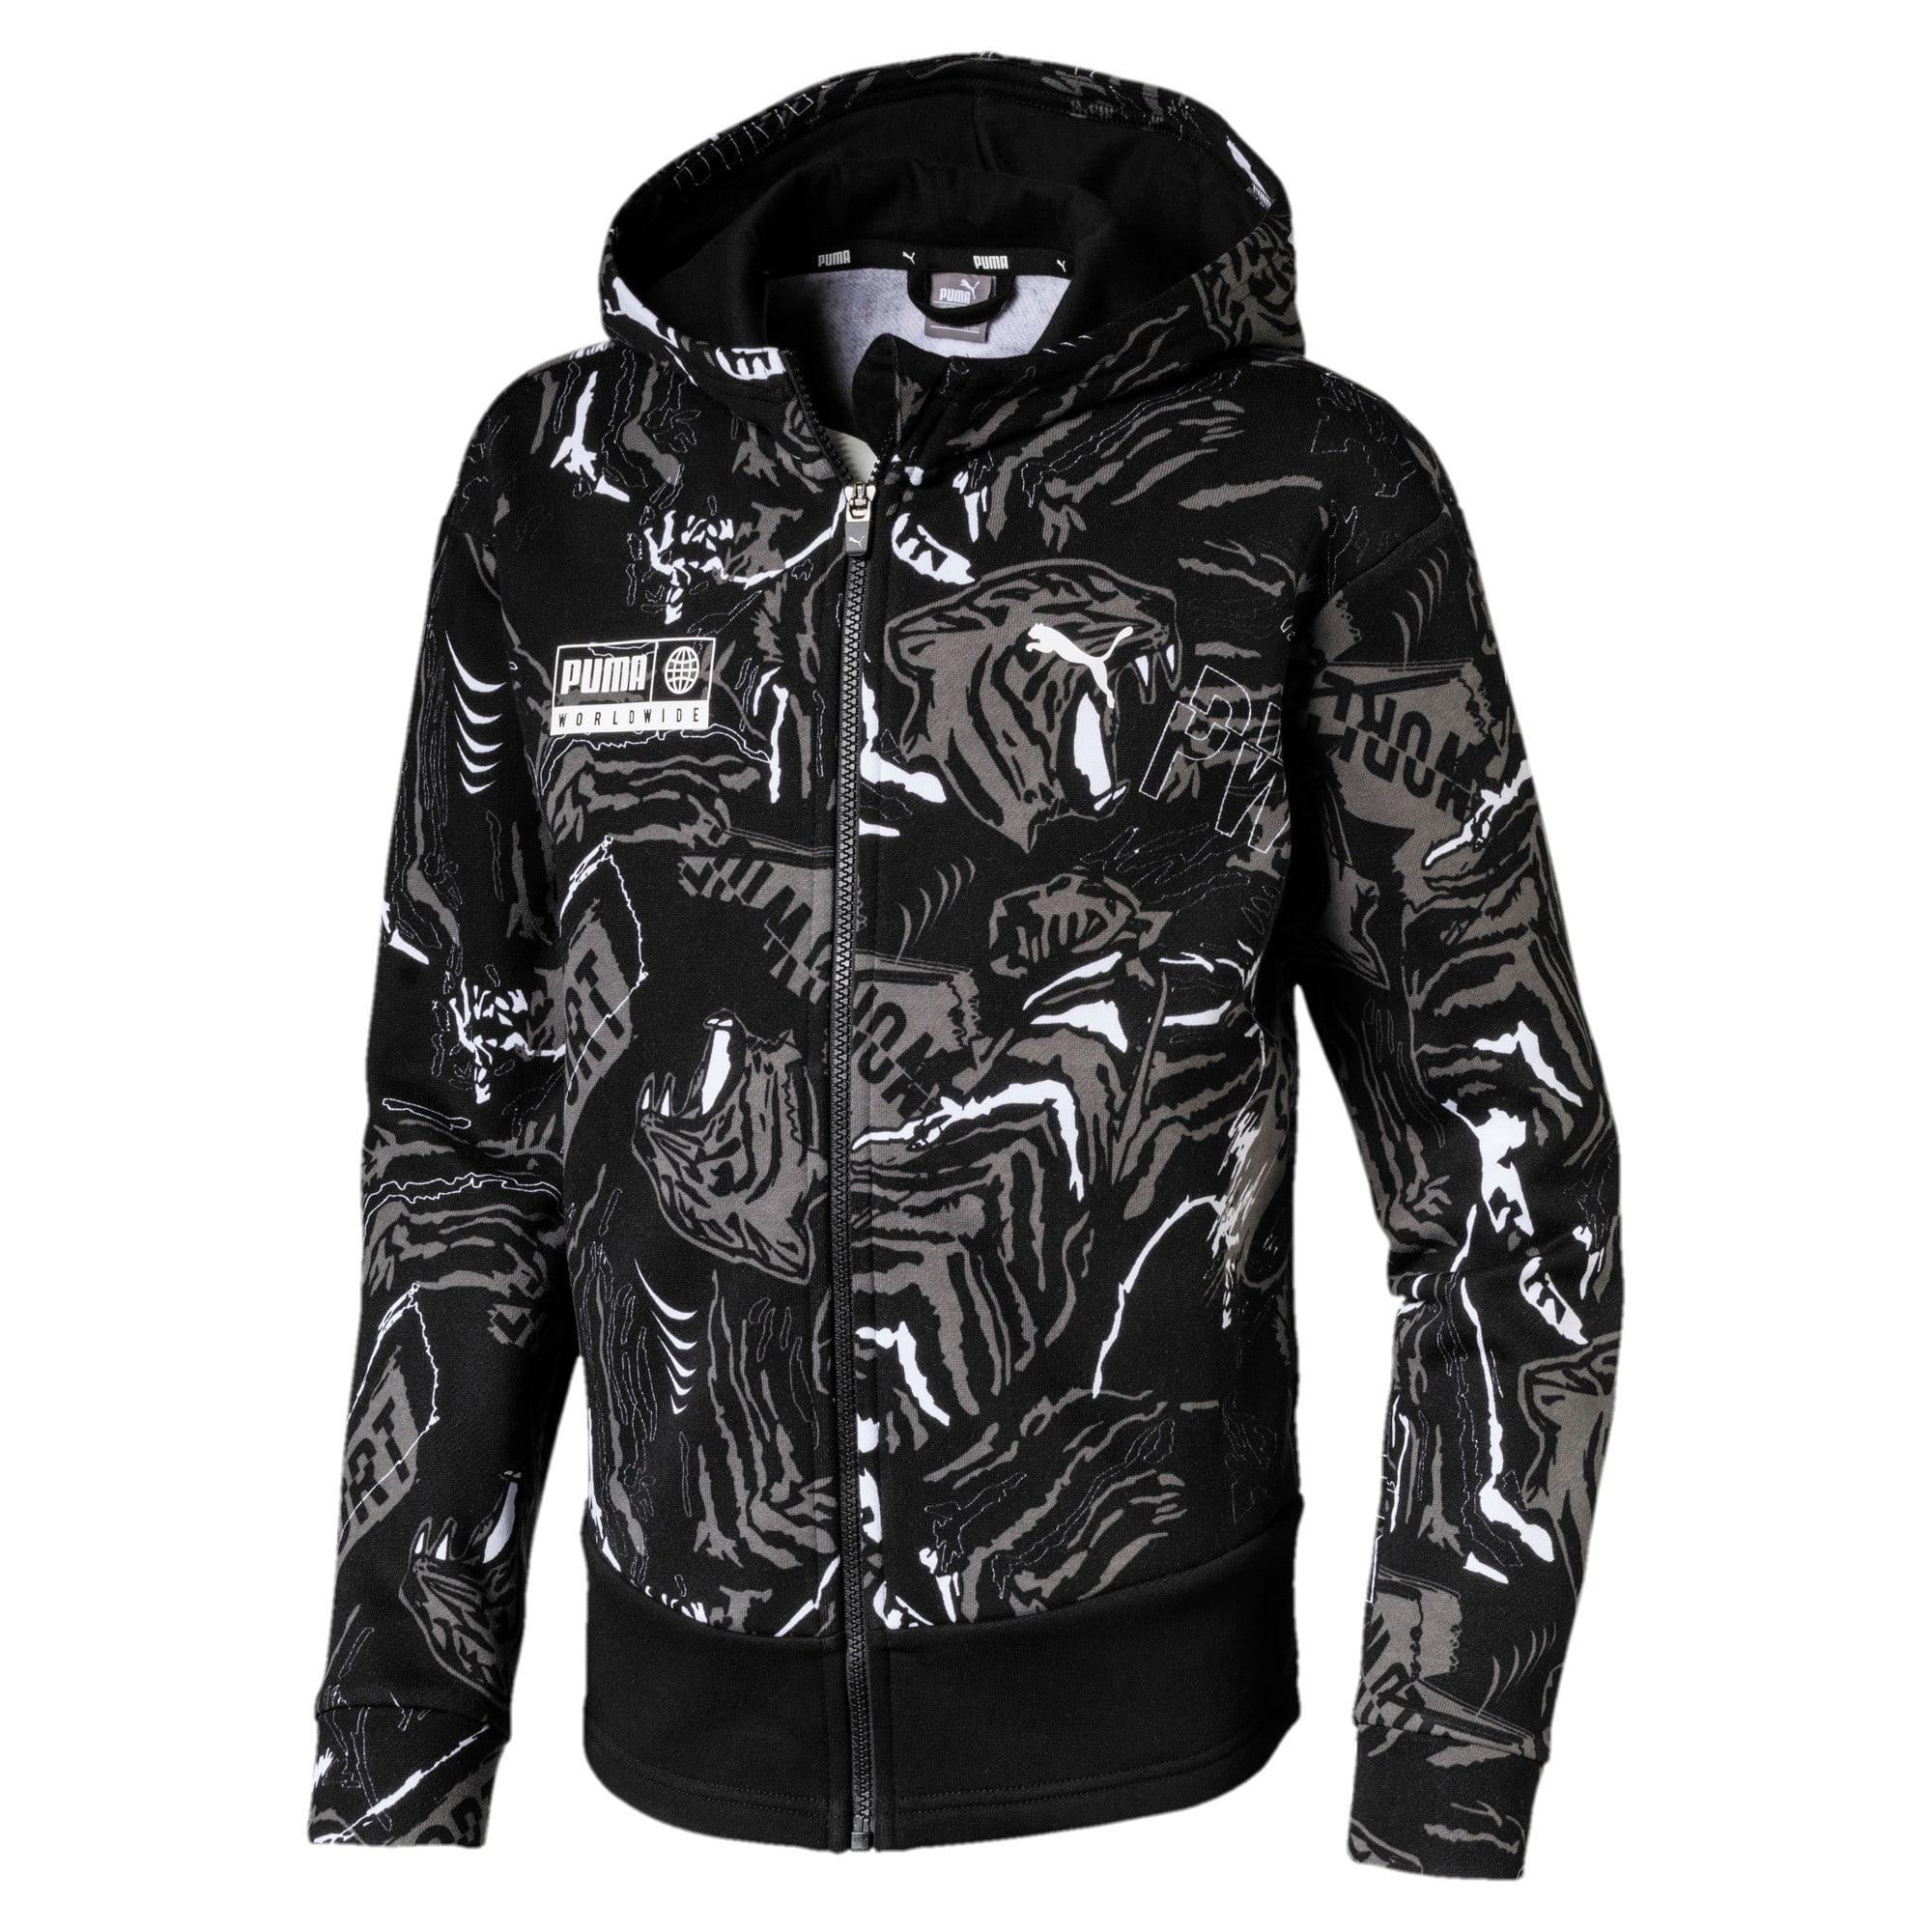 Thumbnail 1 of Alpha Hooded Boys' Sweat Jacket, Puma Black, medium-IND